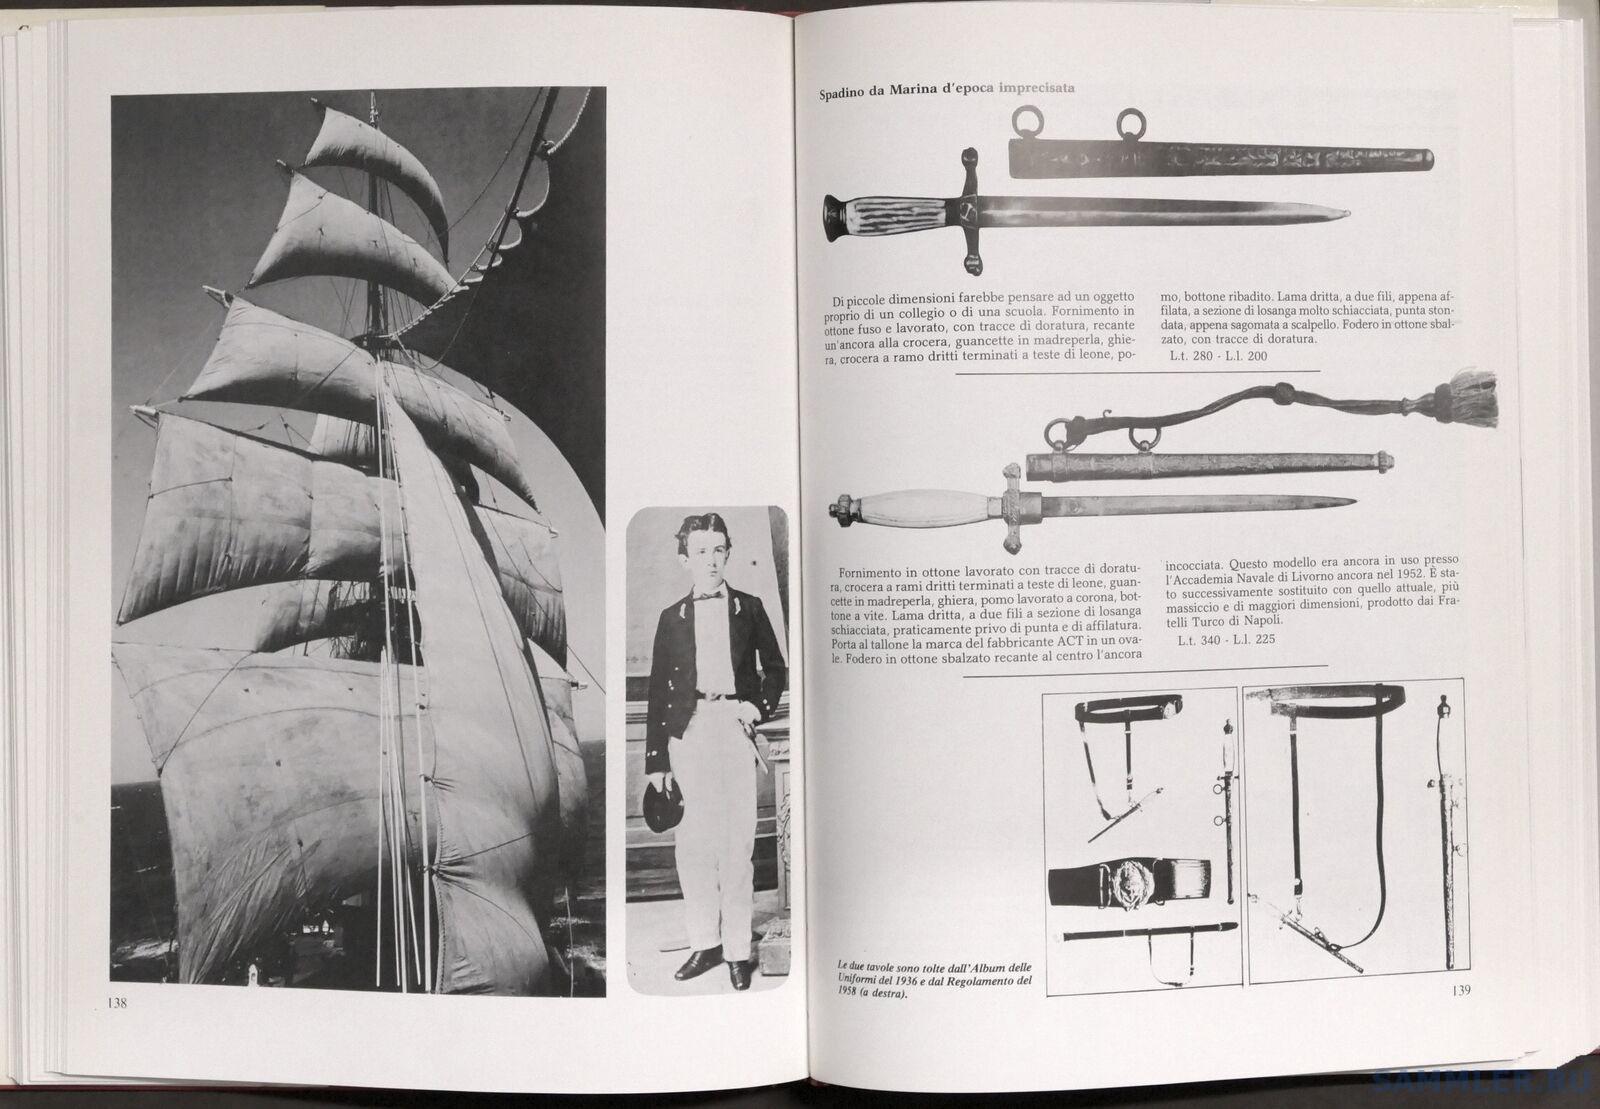 из книги C. Calamandrei - Armi bianche militari italiane - 1814-1950 - 1^ ed. 1987.jpg